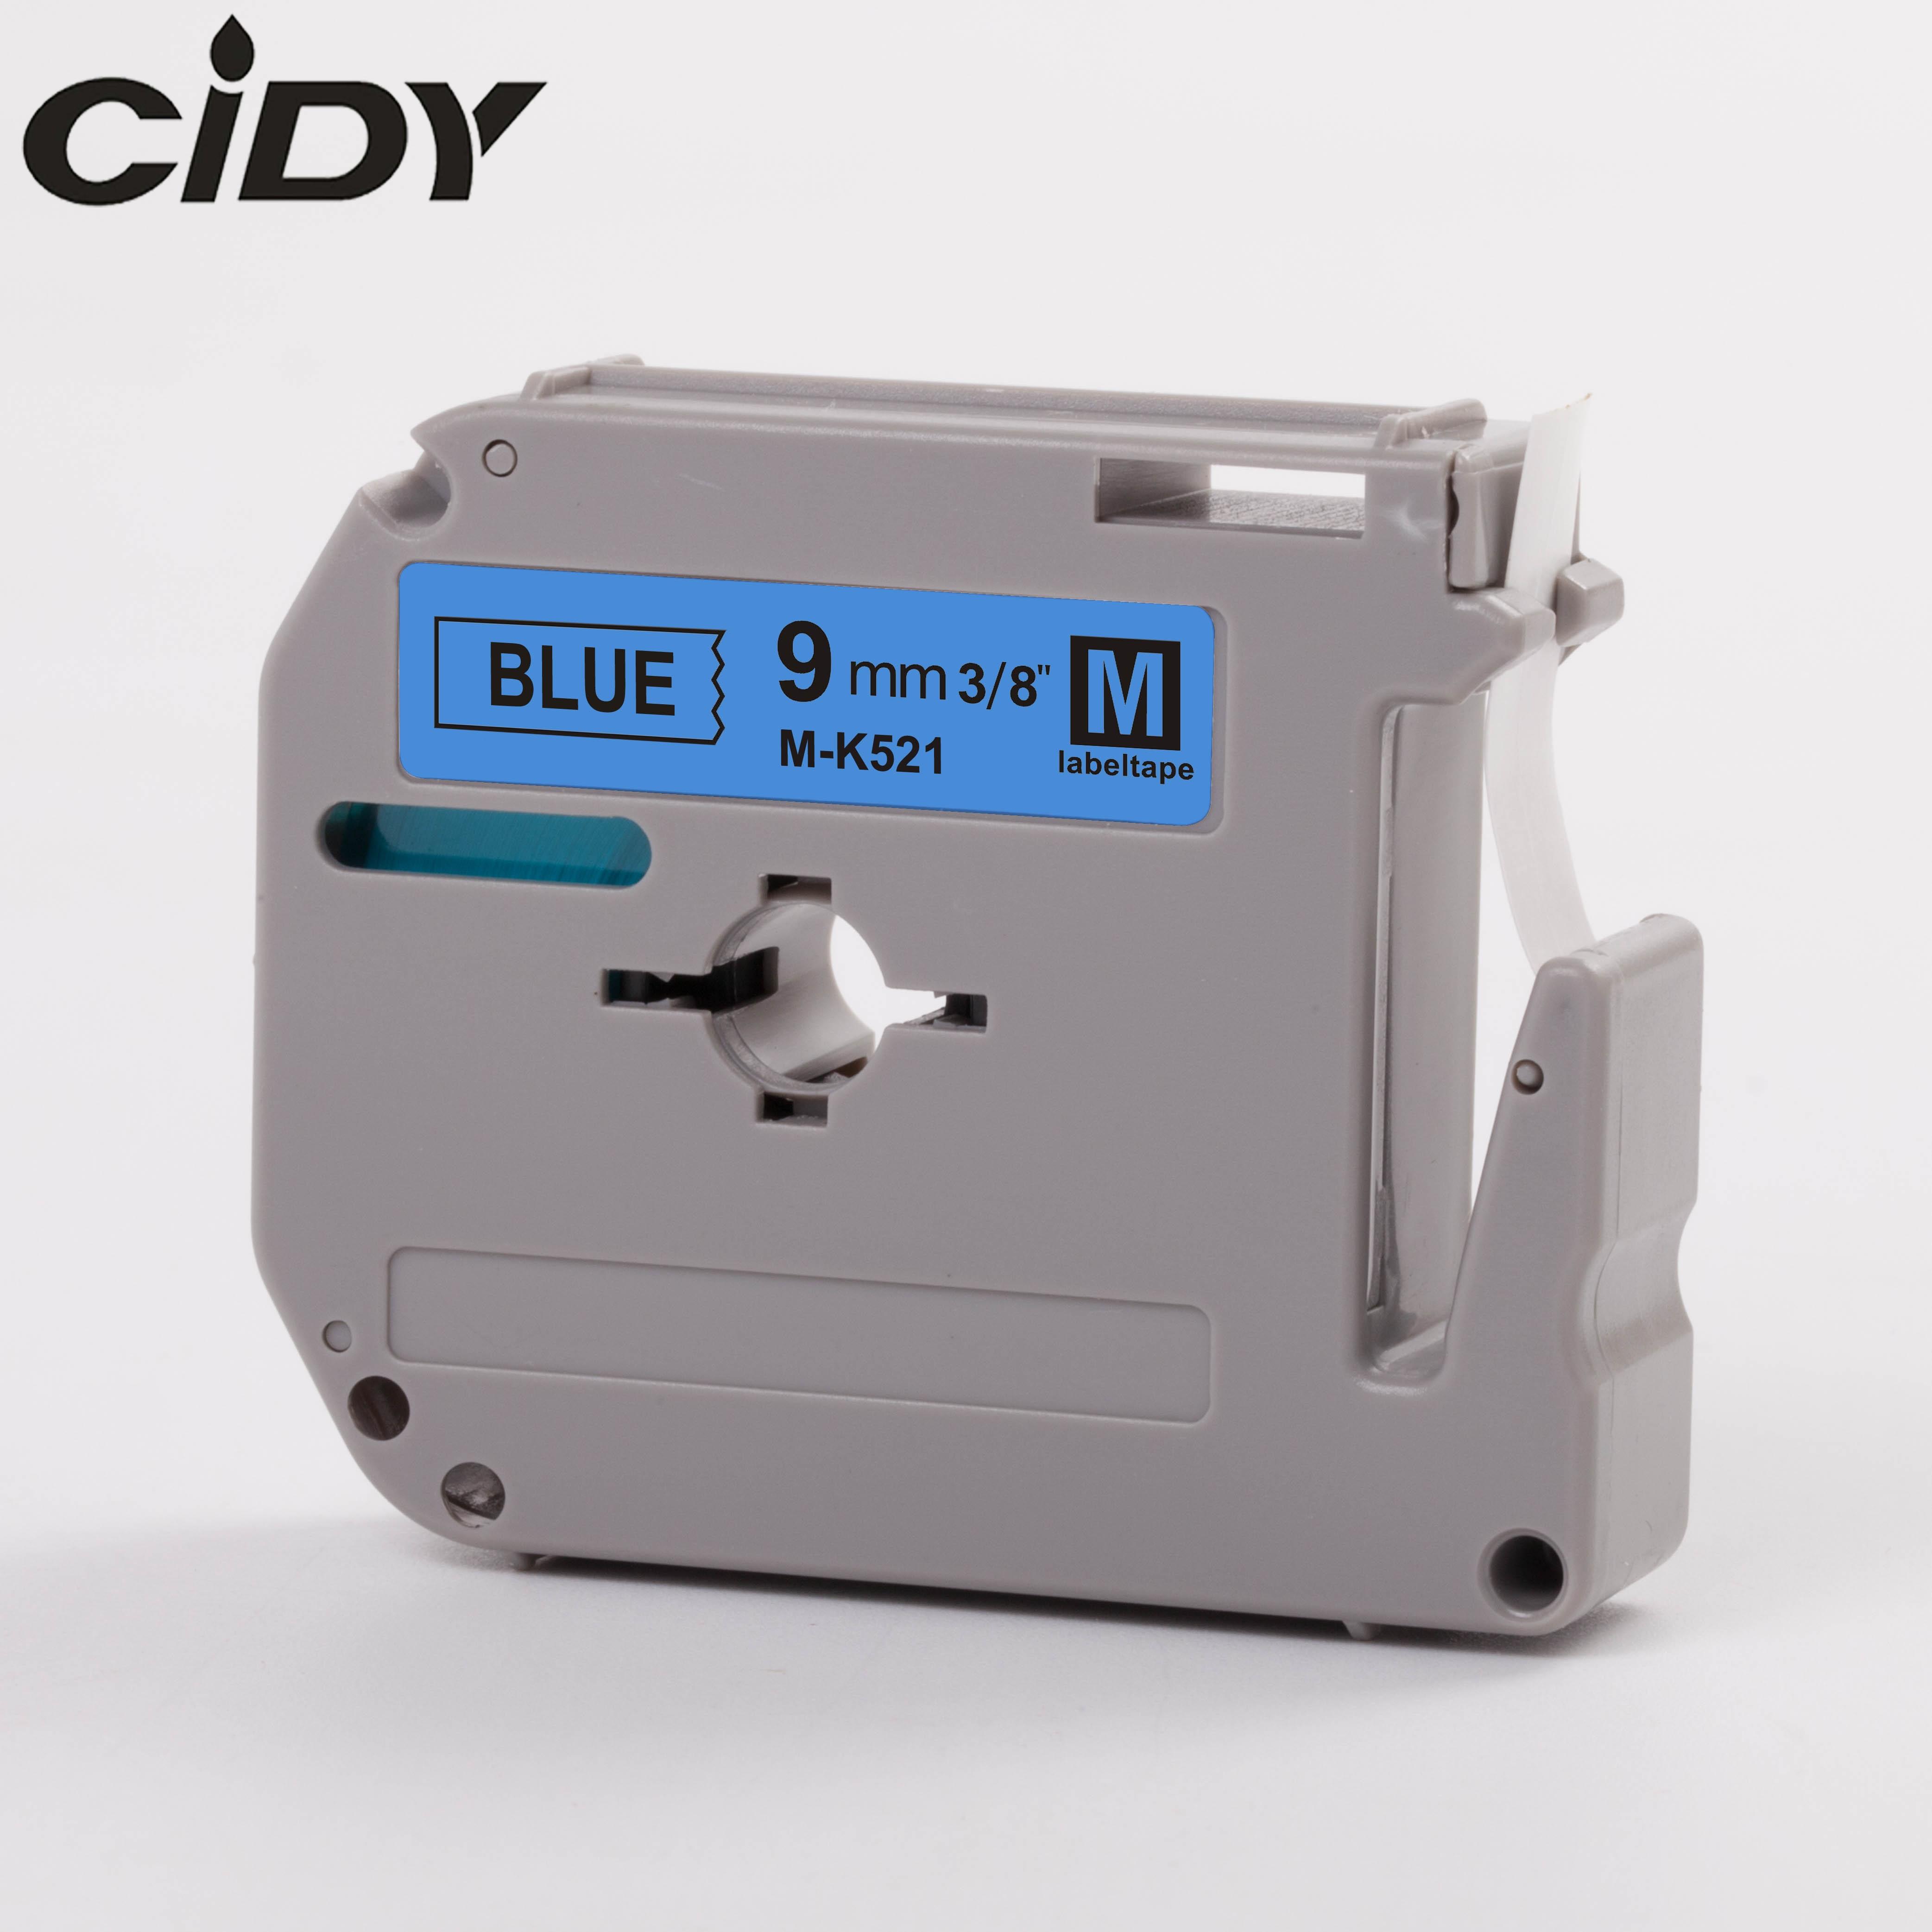 CIDY Compatible brother M-K521 MK521 MK 521 MK-521 negro sobre azul 9mm laminado etiqueta adhesivo fuerte cintas para PT-80 PT-70